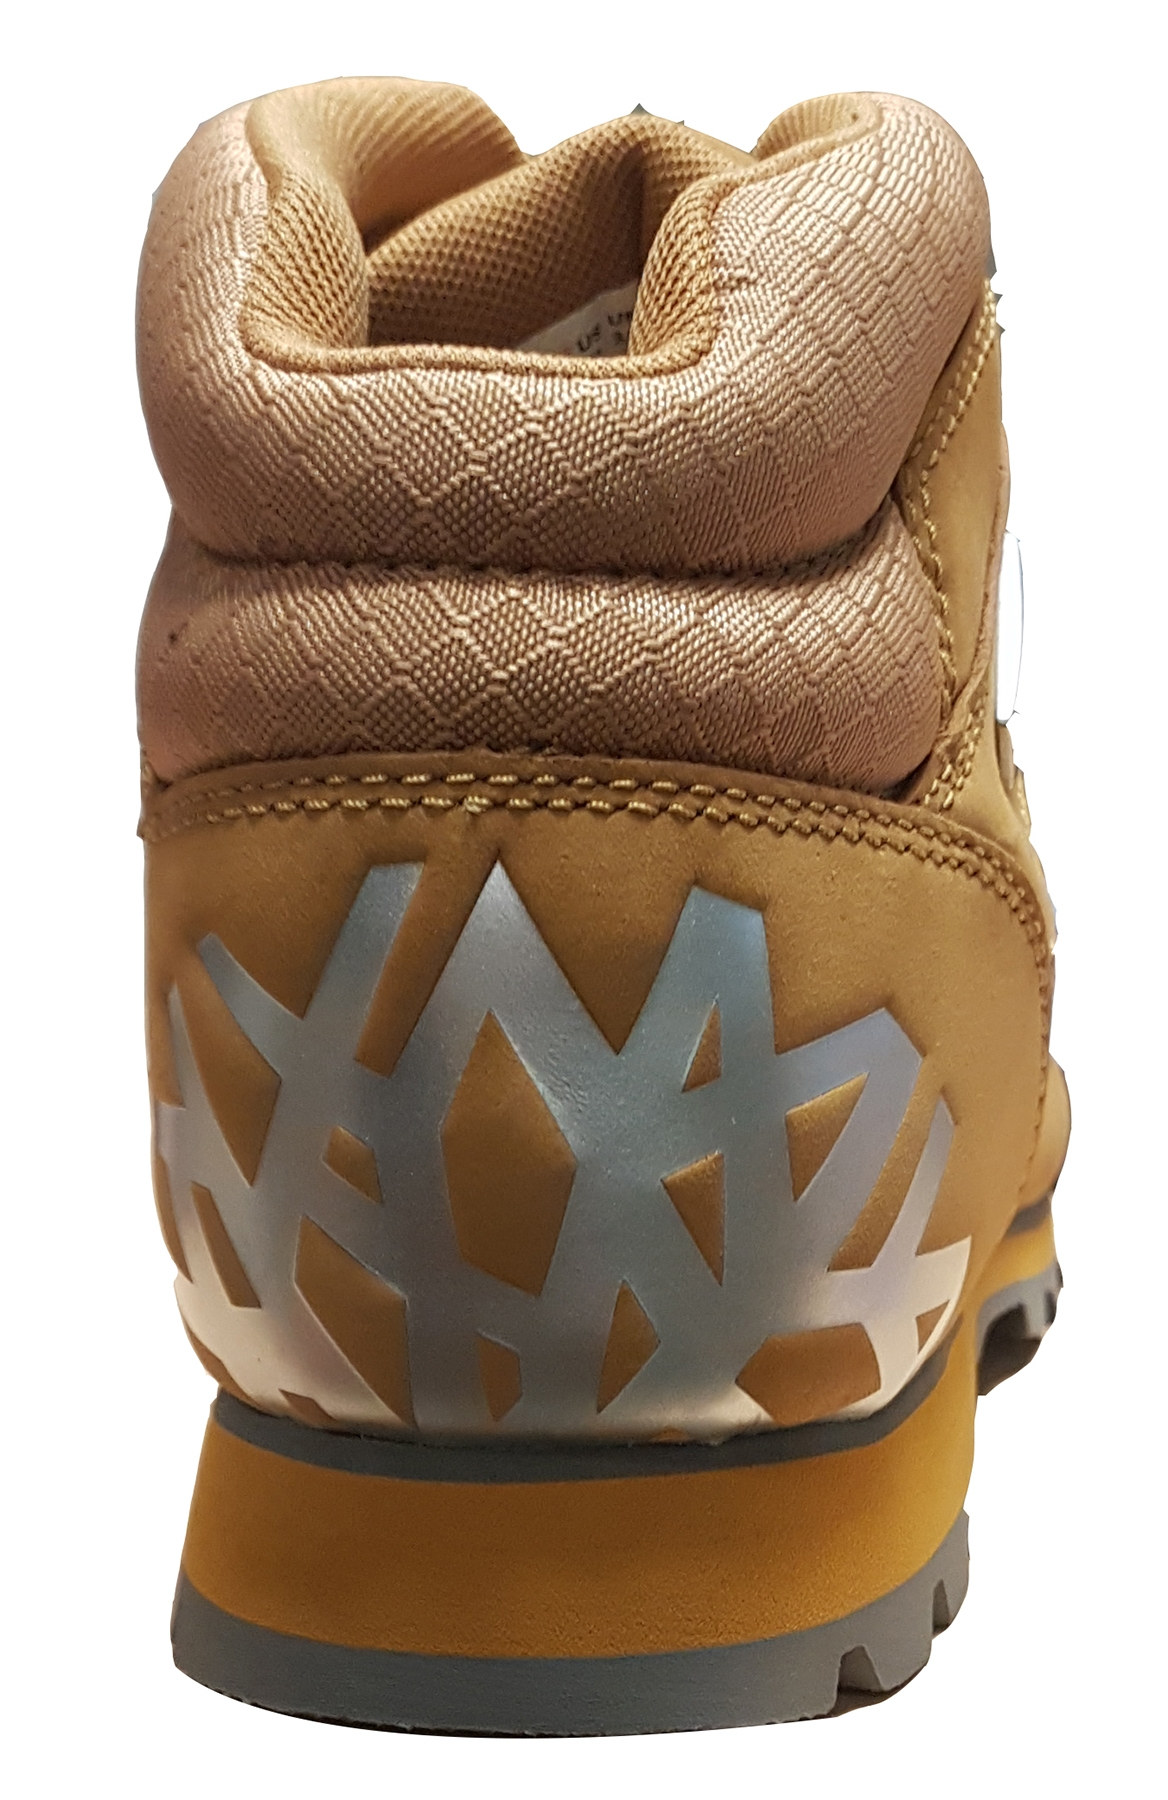 Ski Precision Sprint Timberland Chaussures Wheat Hiker Euro YqUW0ag